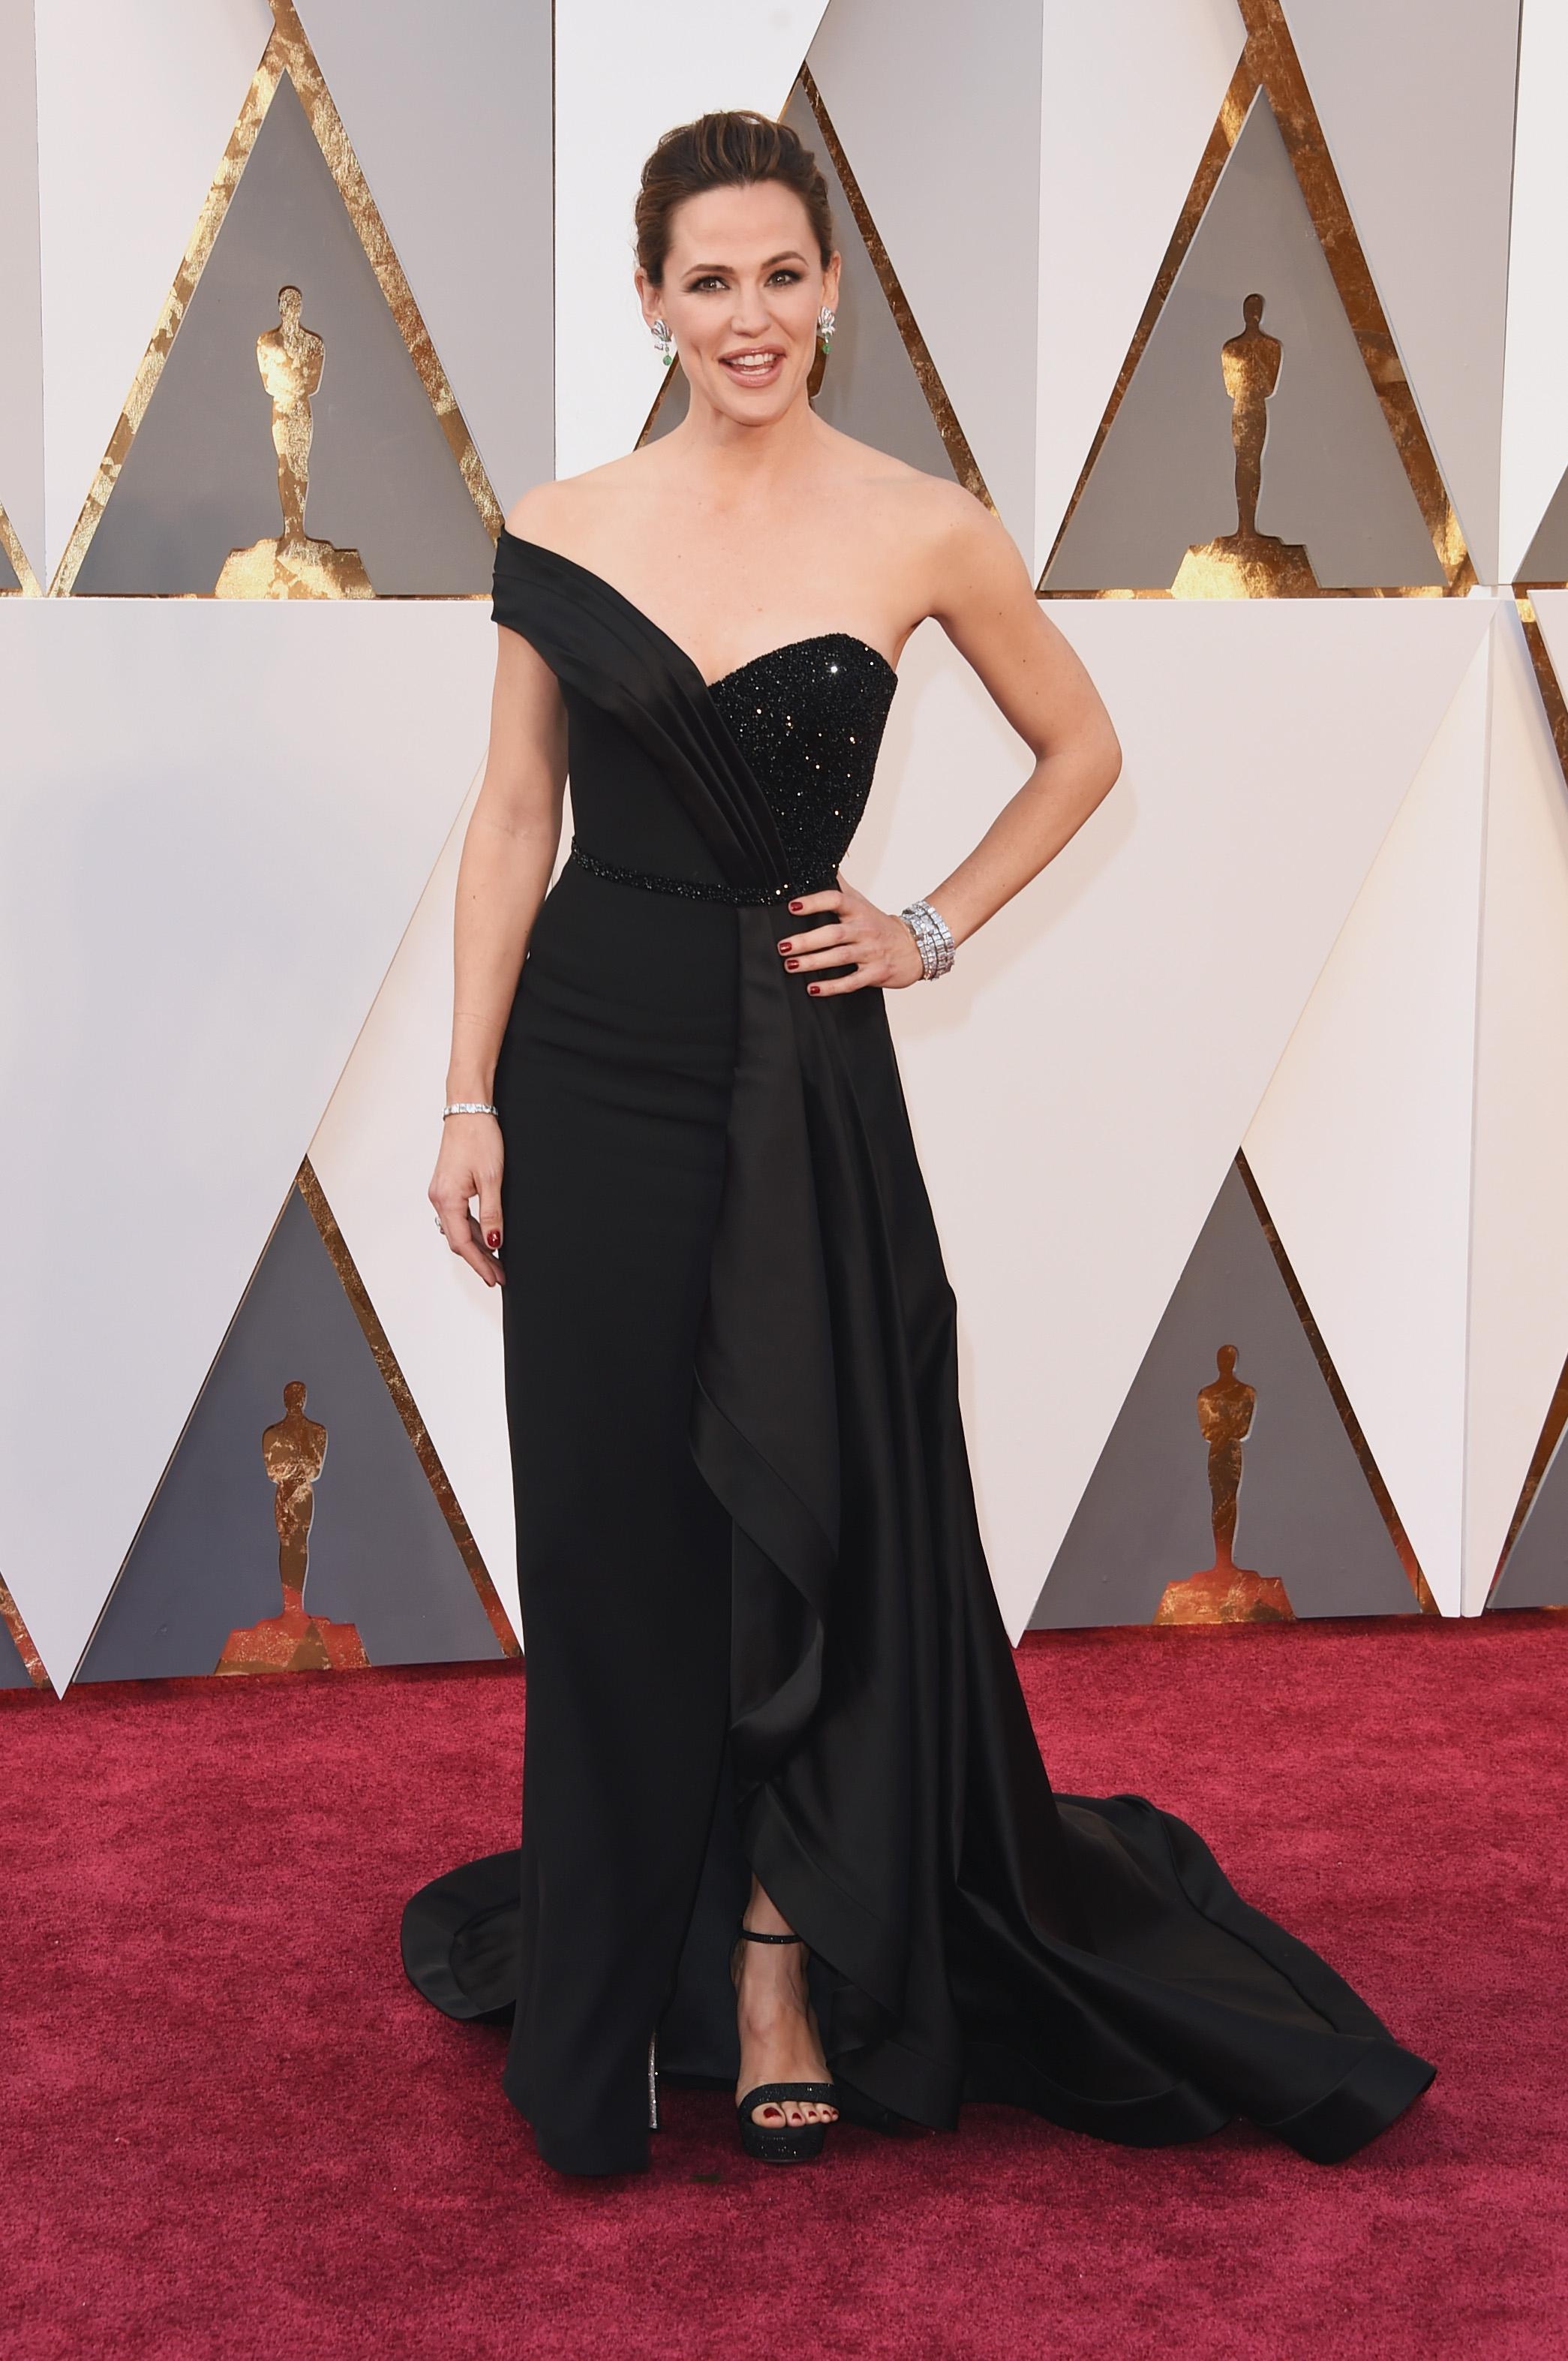 Jennifer Garner's Oscar dress involved a corset bathroom nightmare